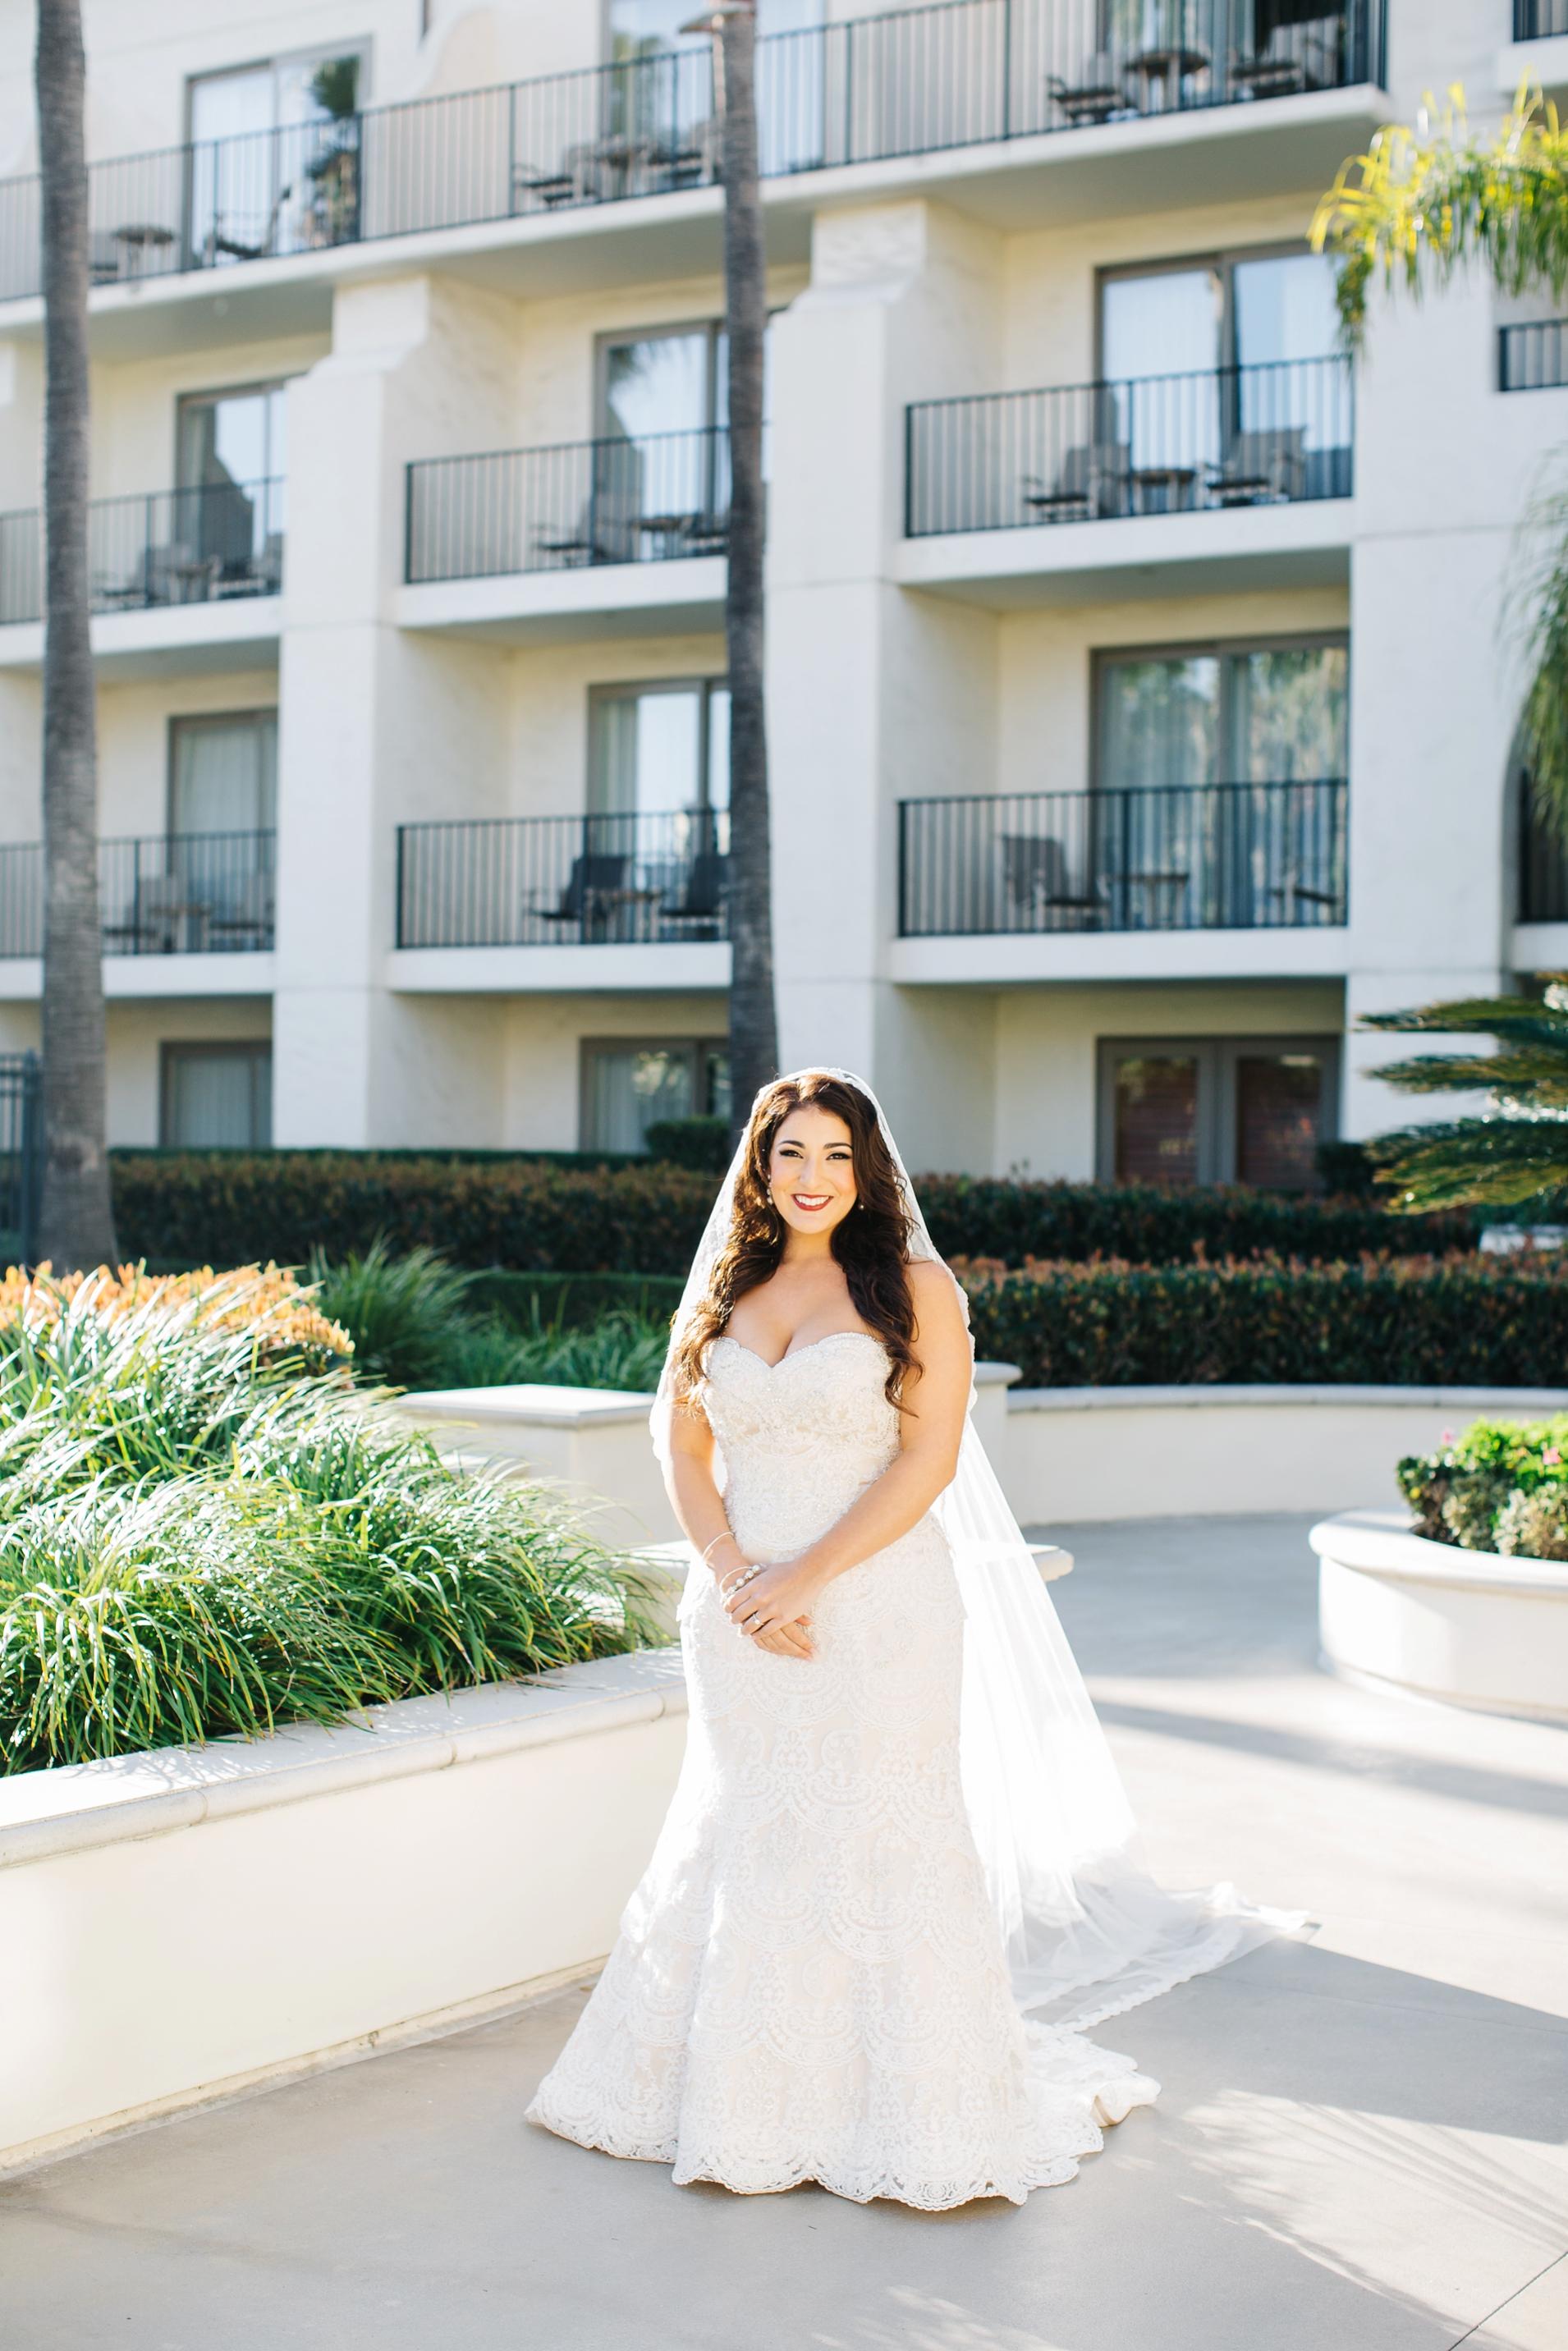 Stunning Huntington Beach Bride - Huntington Beach, CA